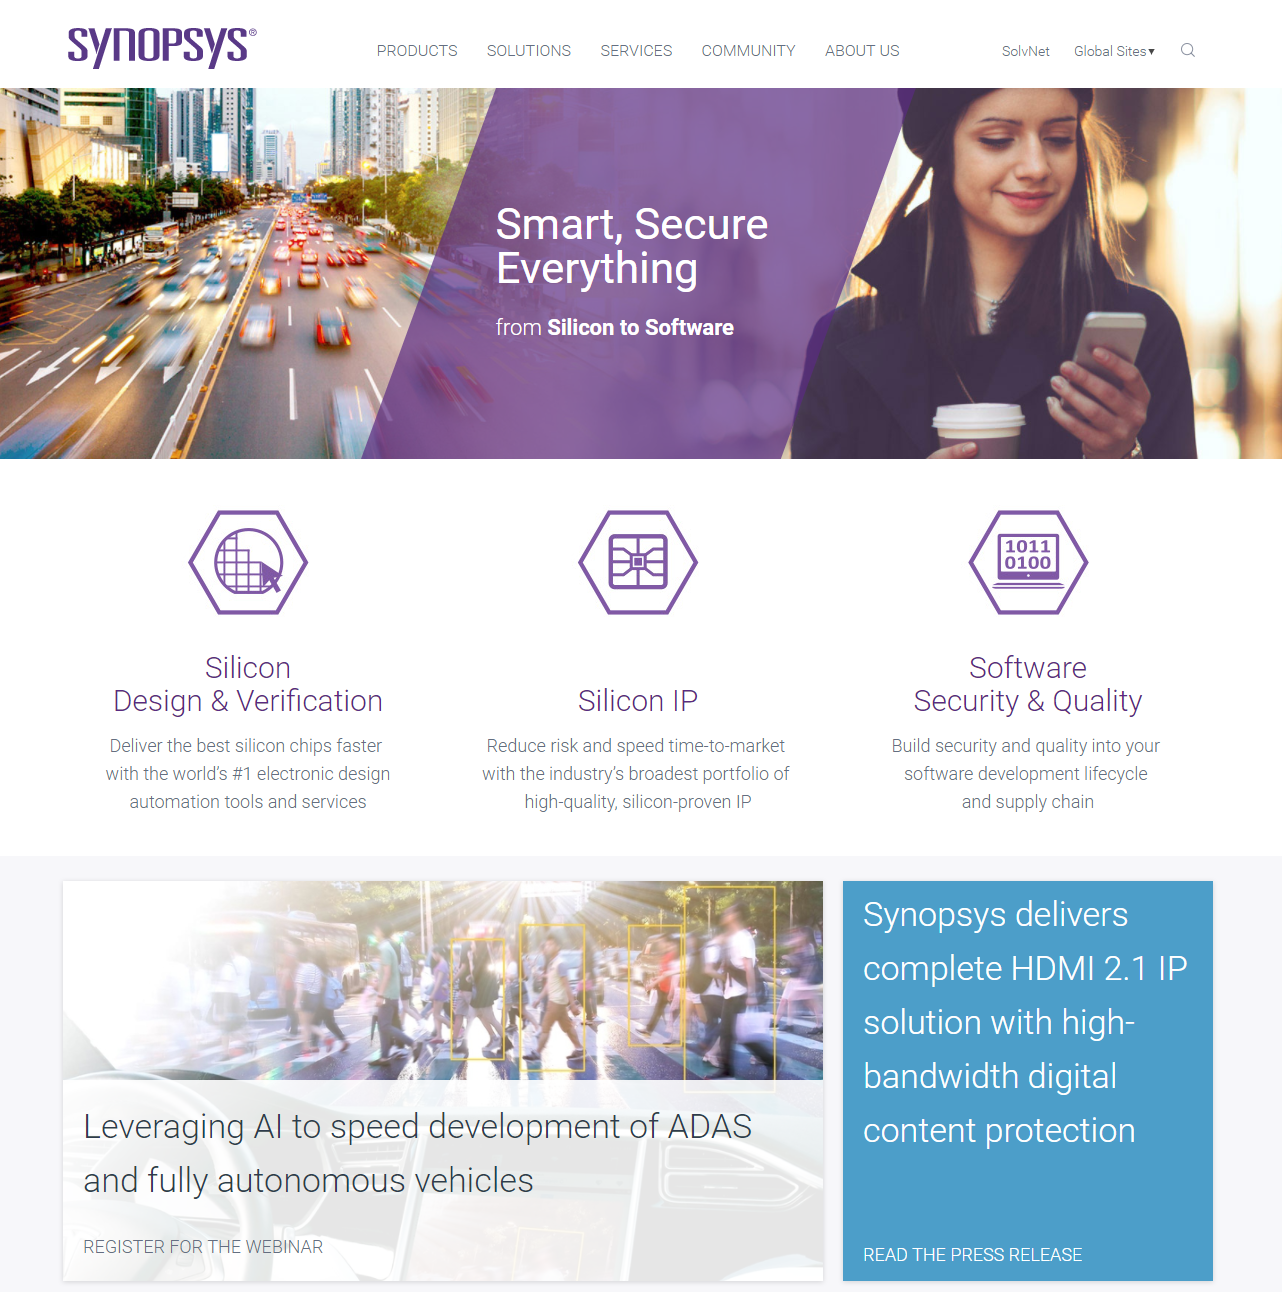 image of Synopsys Digital Marketing Team Wins 2017 Best Electronics Mobile Website Mobile WebAward for Synopsys.com